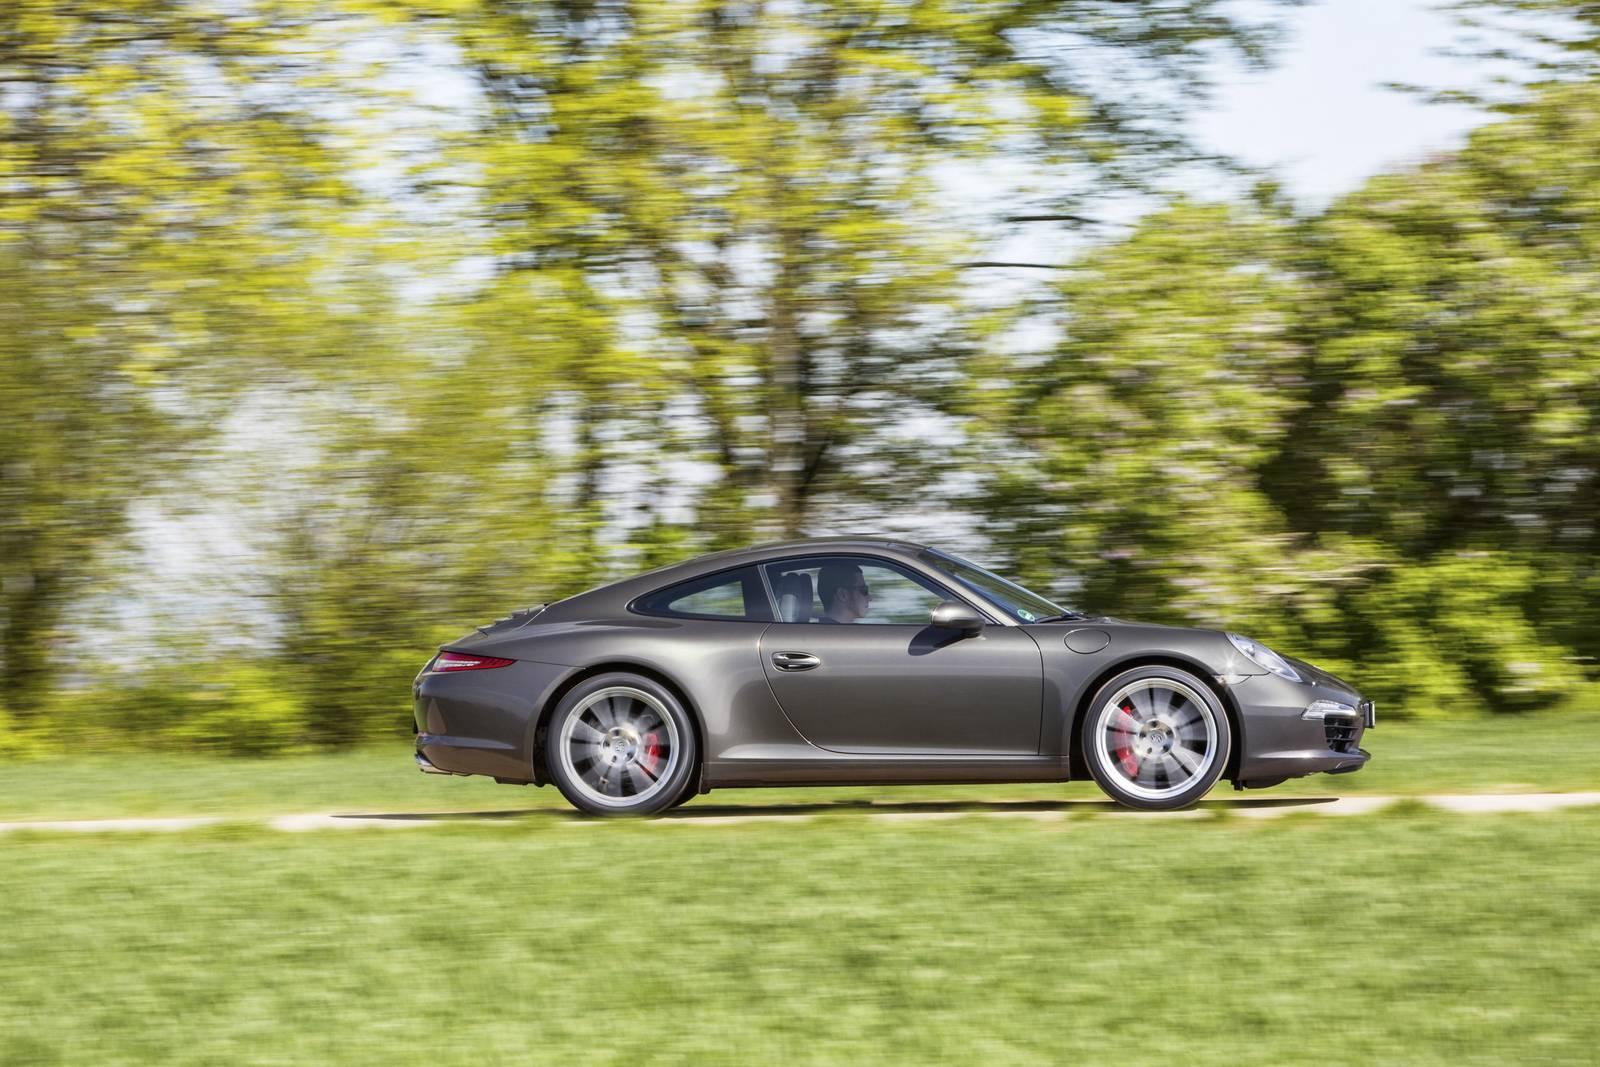 Official Porsche Tequipment 911 Carrera 20th Anniversary